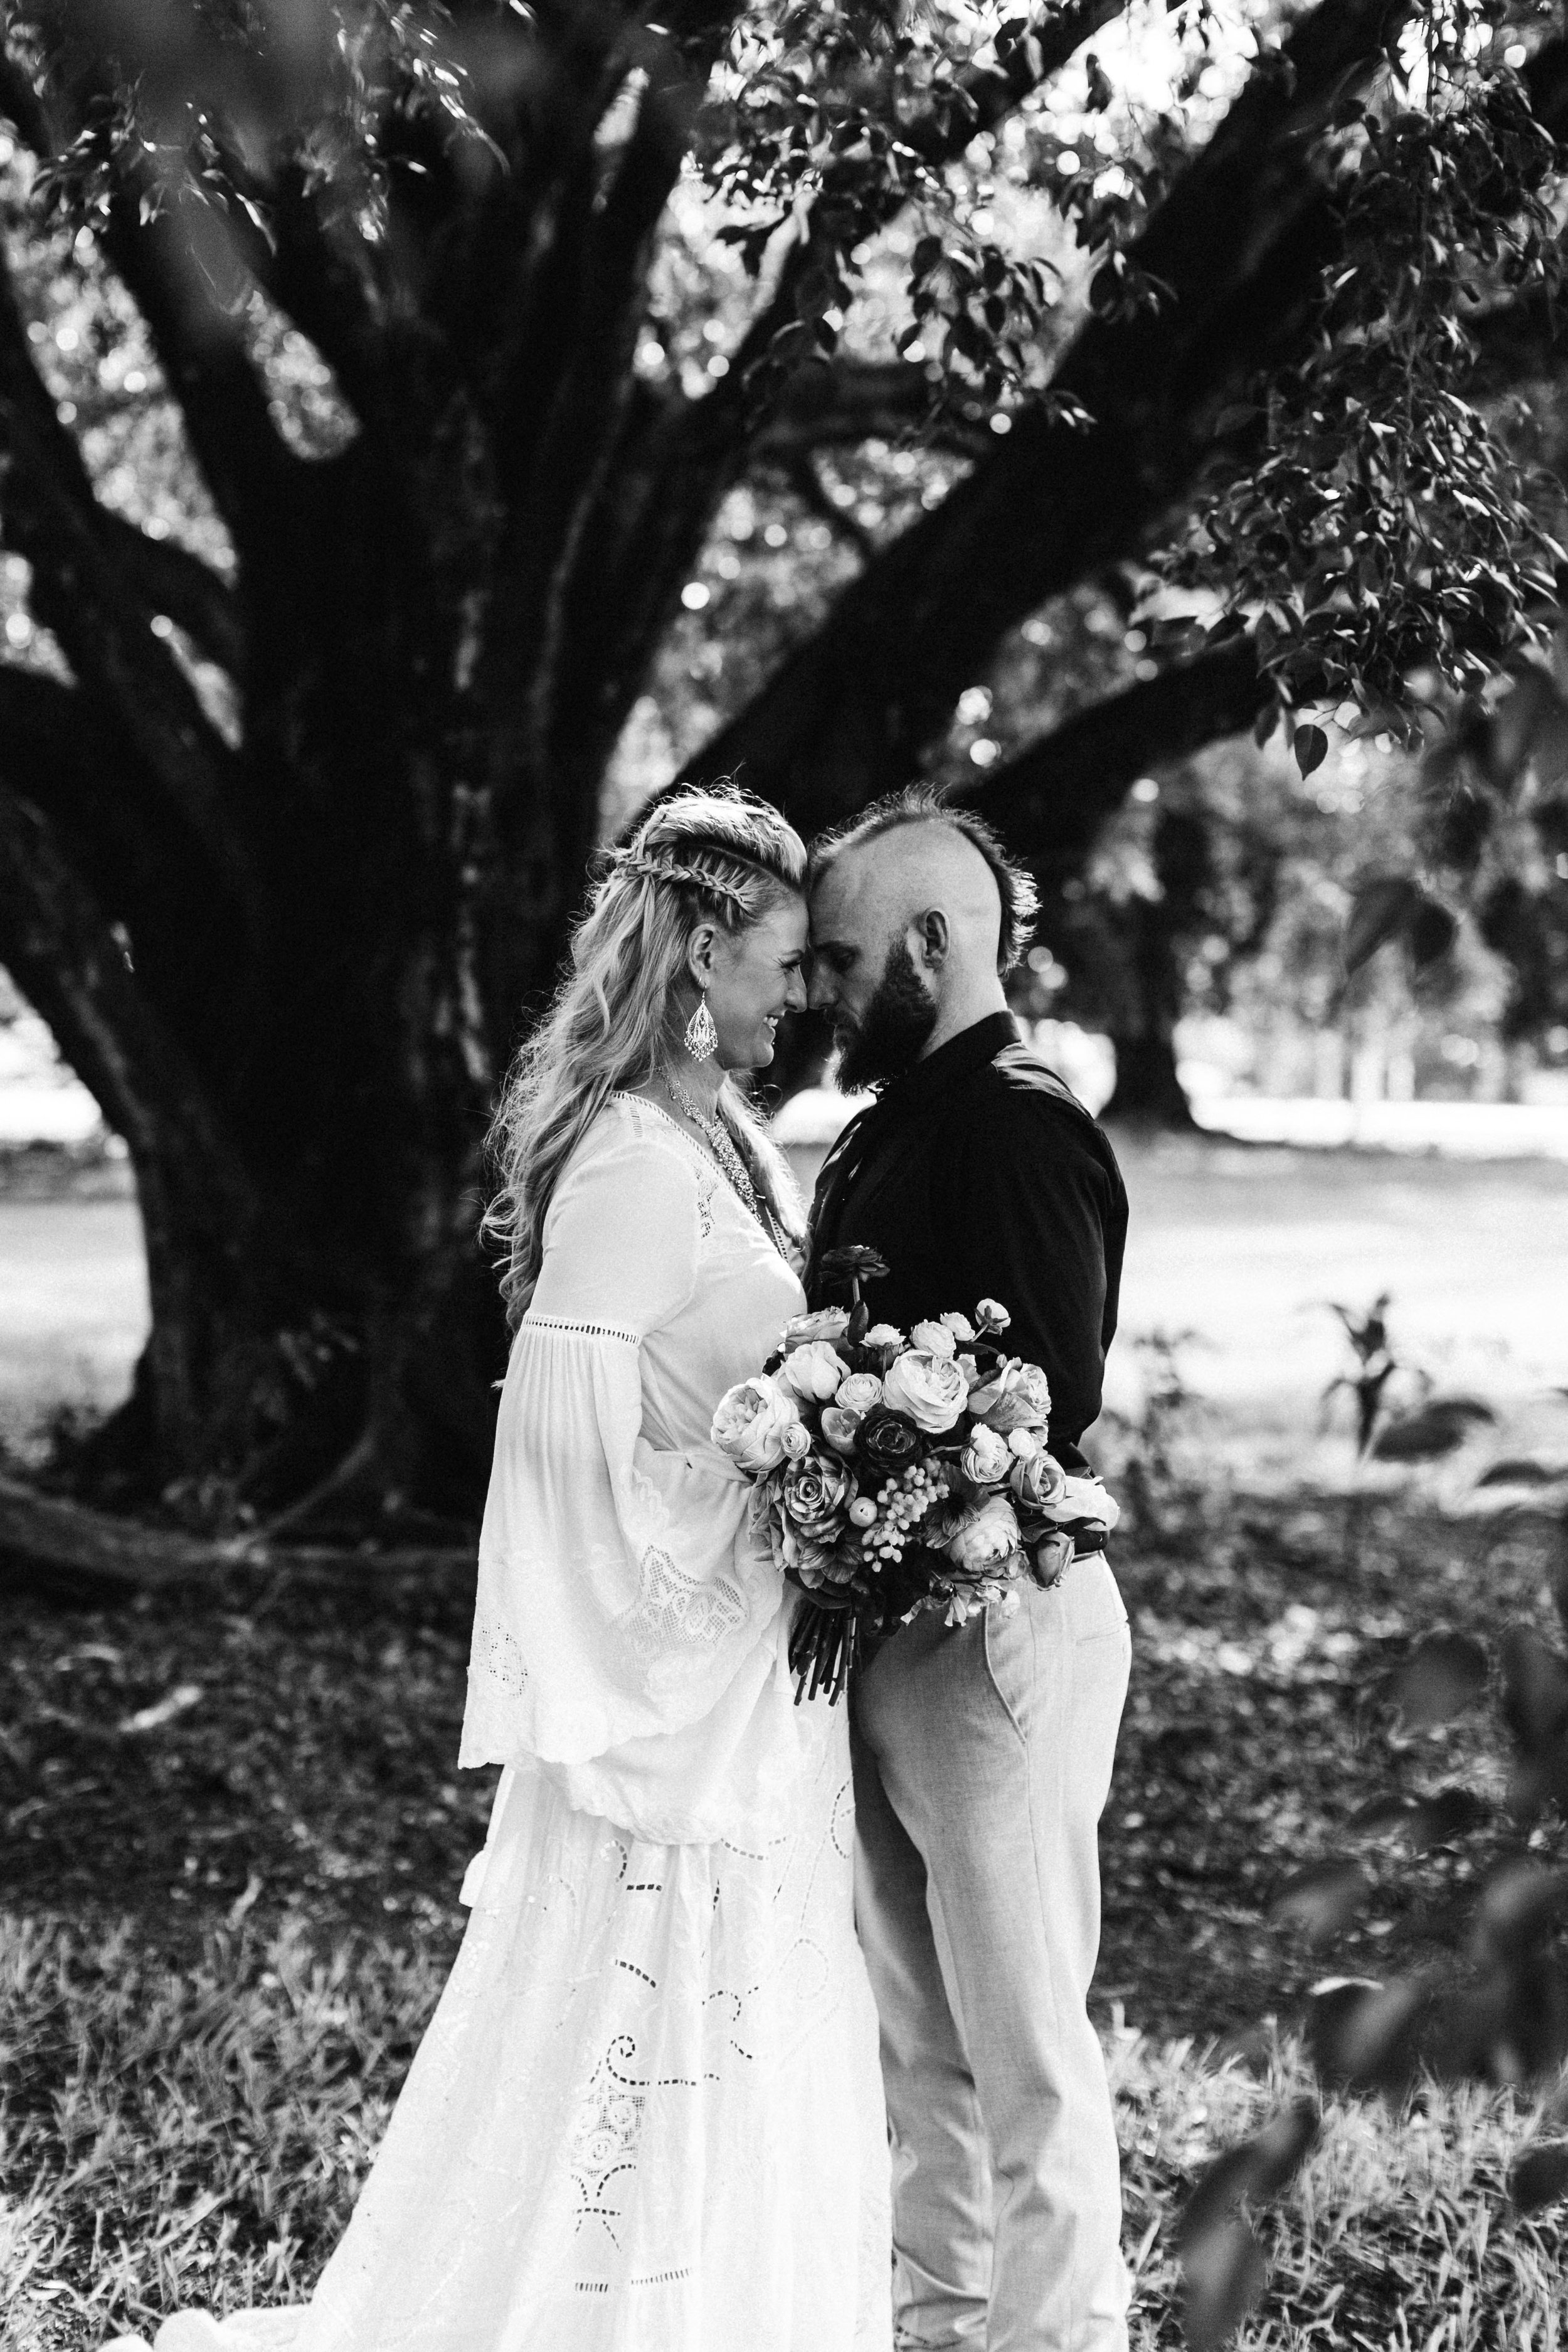 darwin-elopement-wedding-beach-camden-photography-www.emilyobrienphotography.net-30.jpg